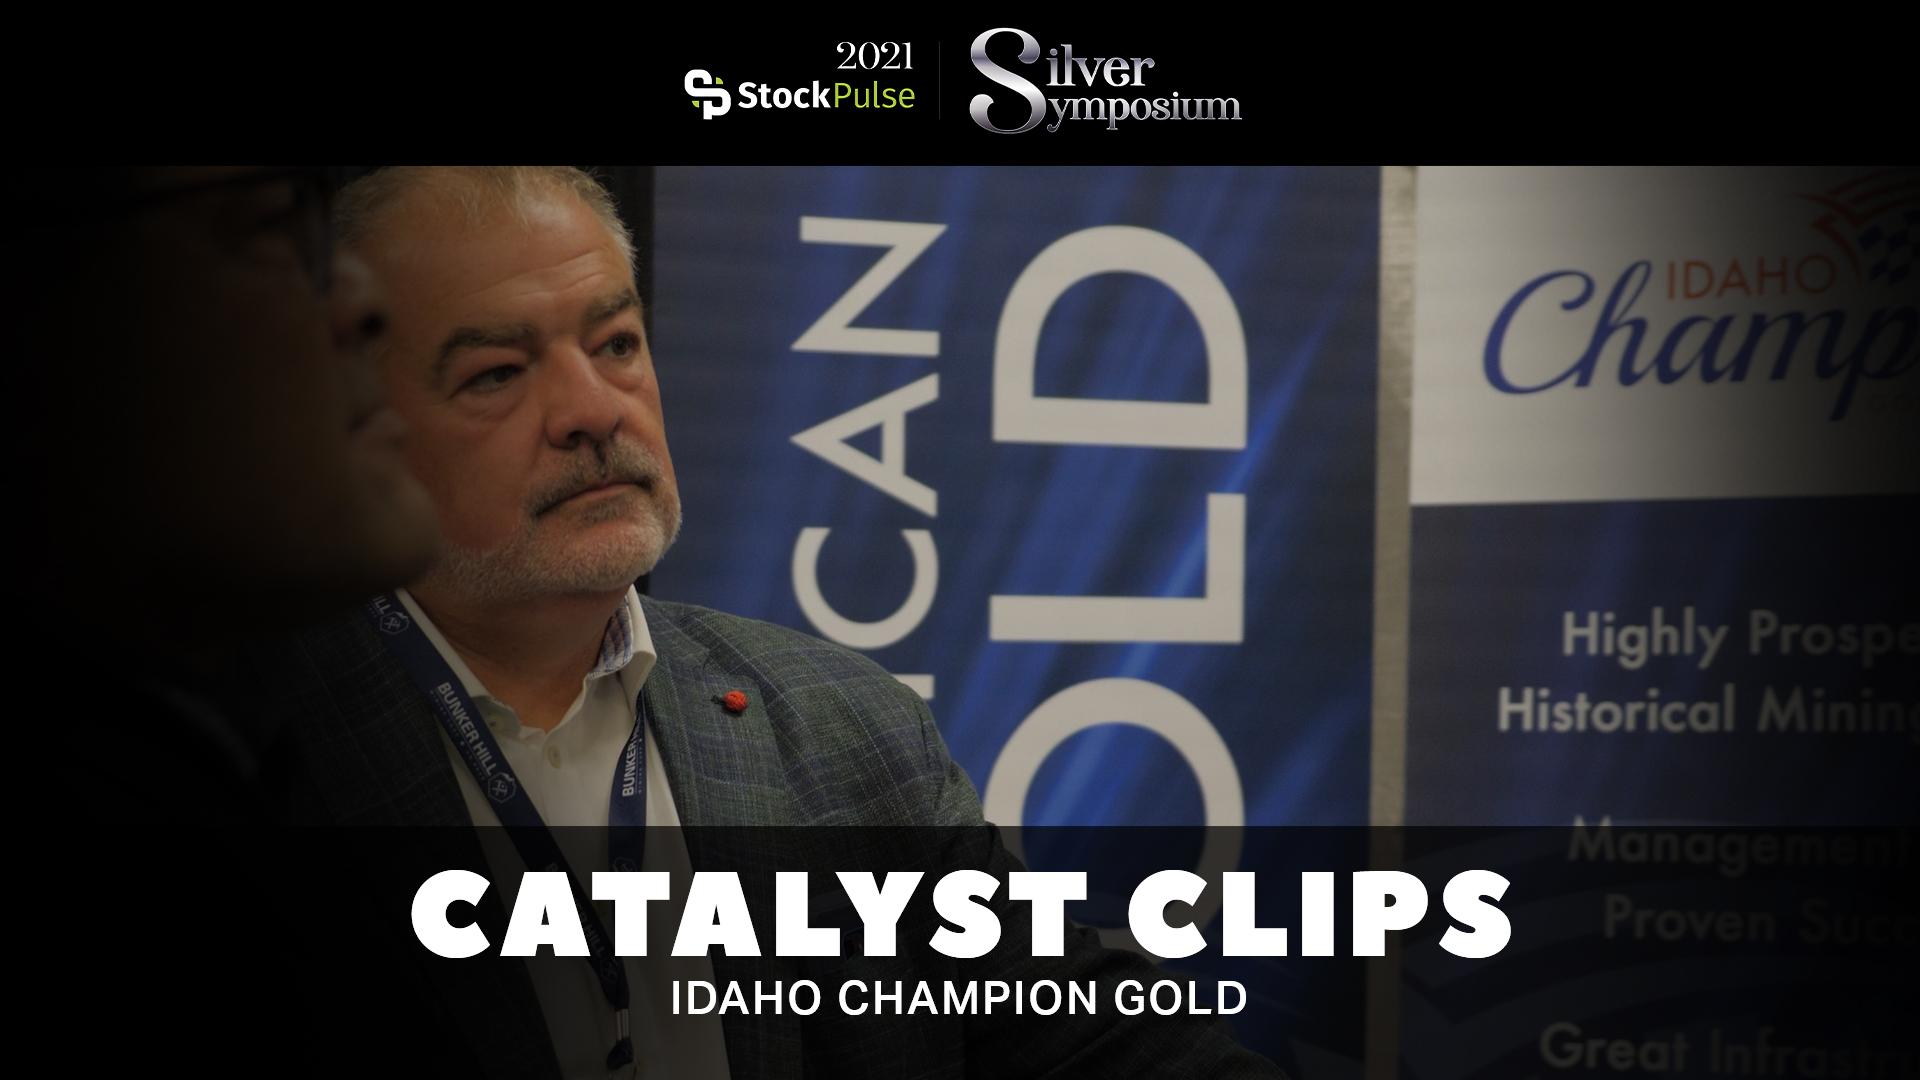 2021 StockPulse Silver Symposium Catalyst Clips | Jonathan Buick of Idaho Champion Gold